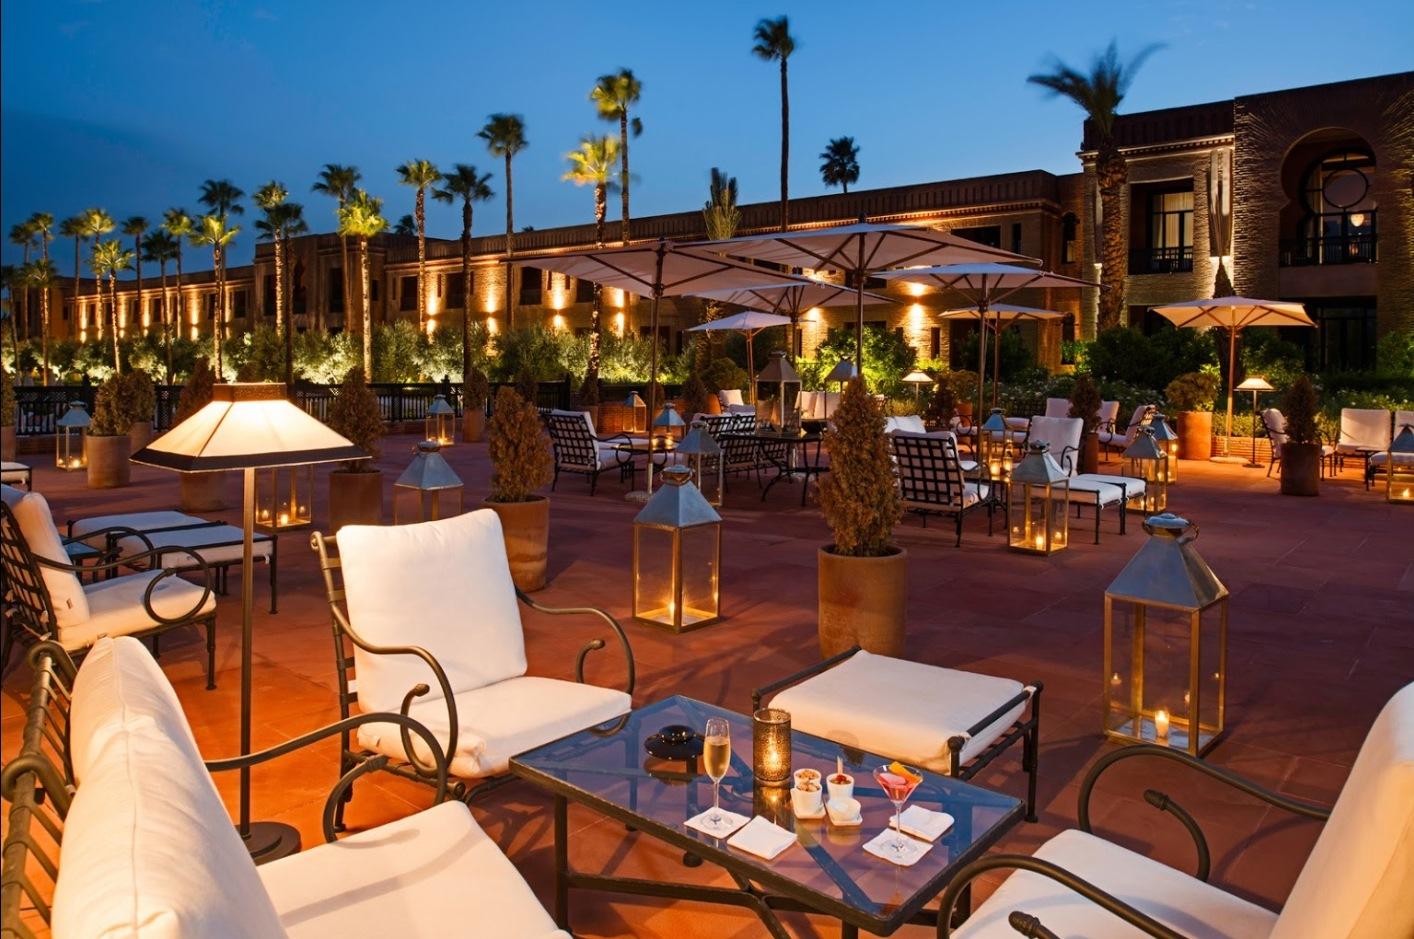 Hotel Selman Marrakech-Morocco-6.jpg